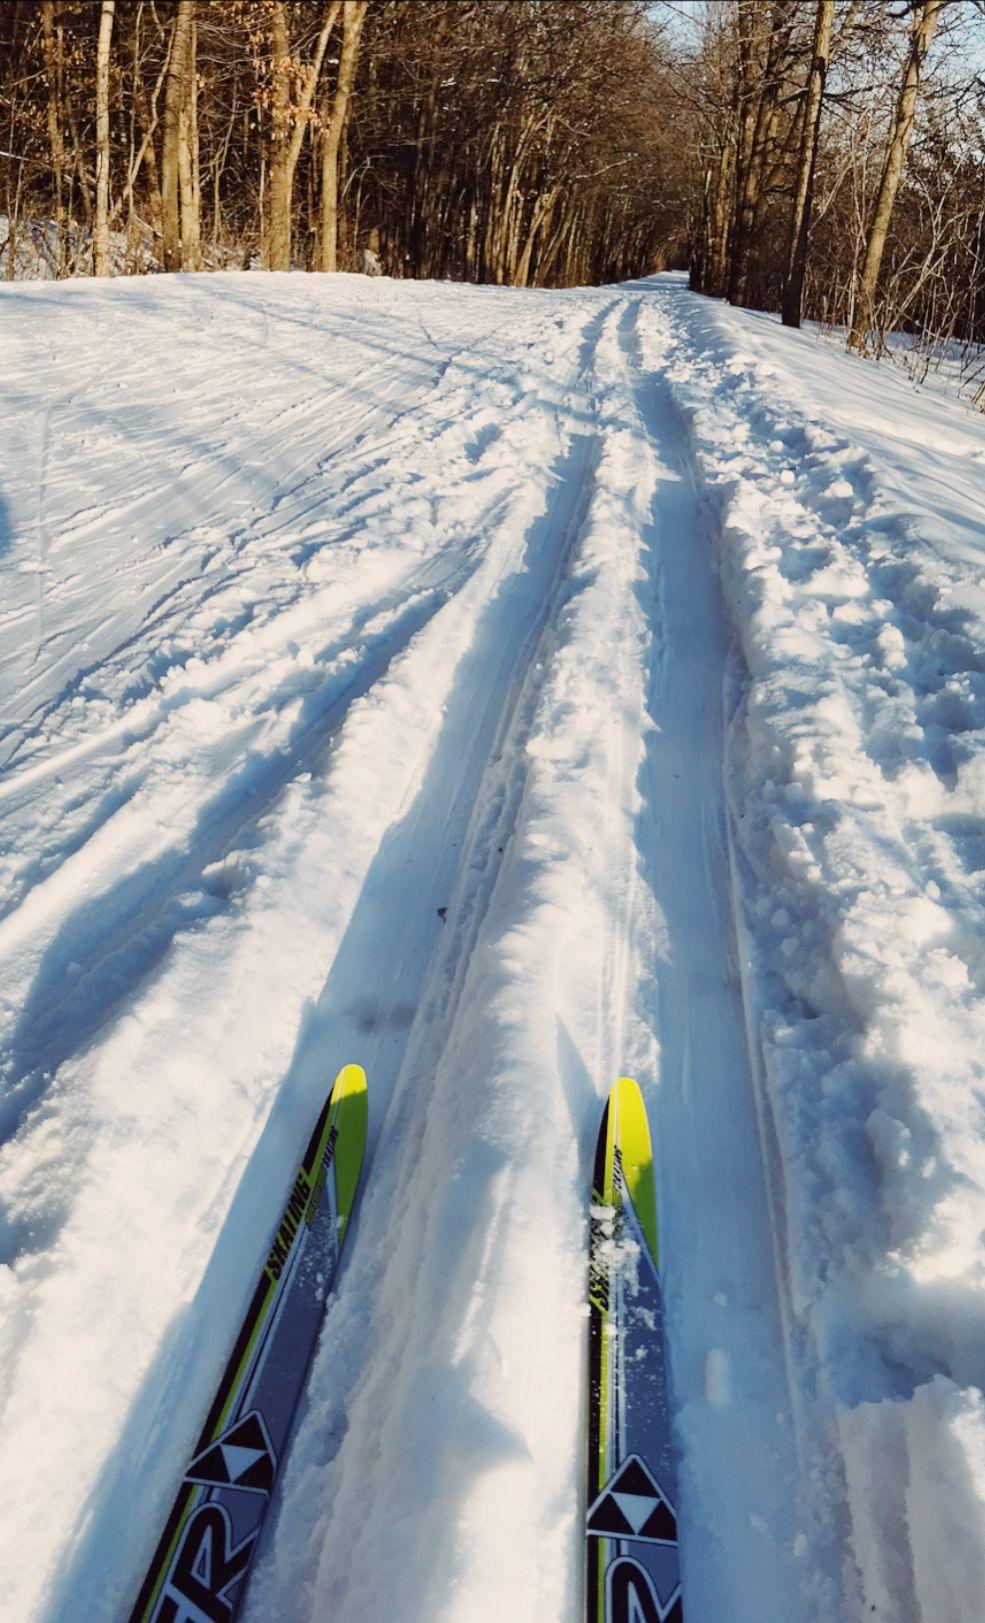 Carver County Park Mn Ski Trail Ski Nordic Crosscountry Ski Trails County Park Skiing